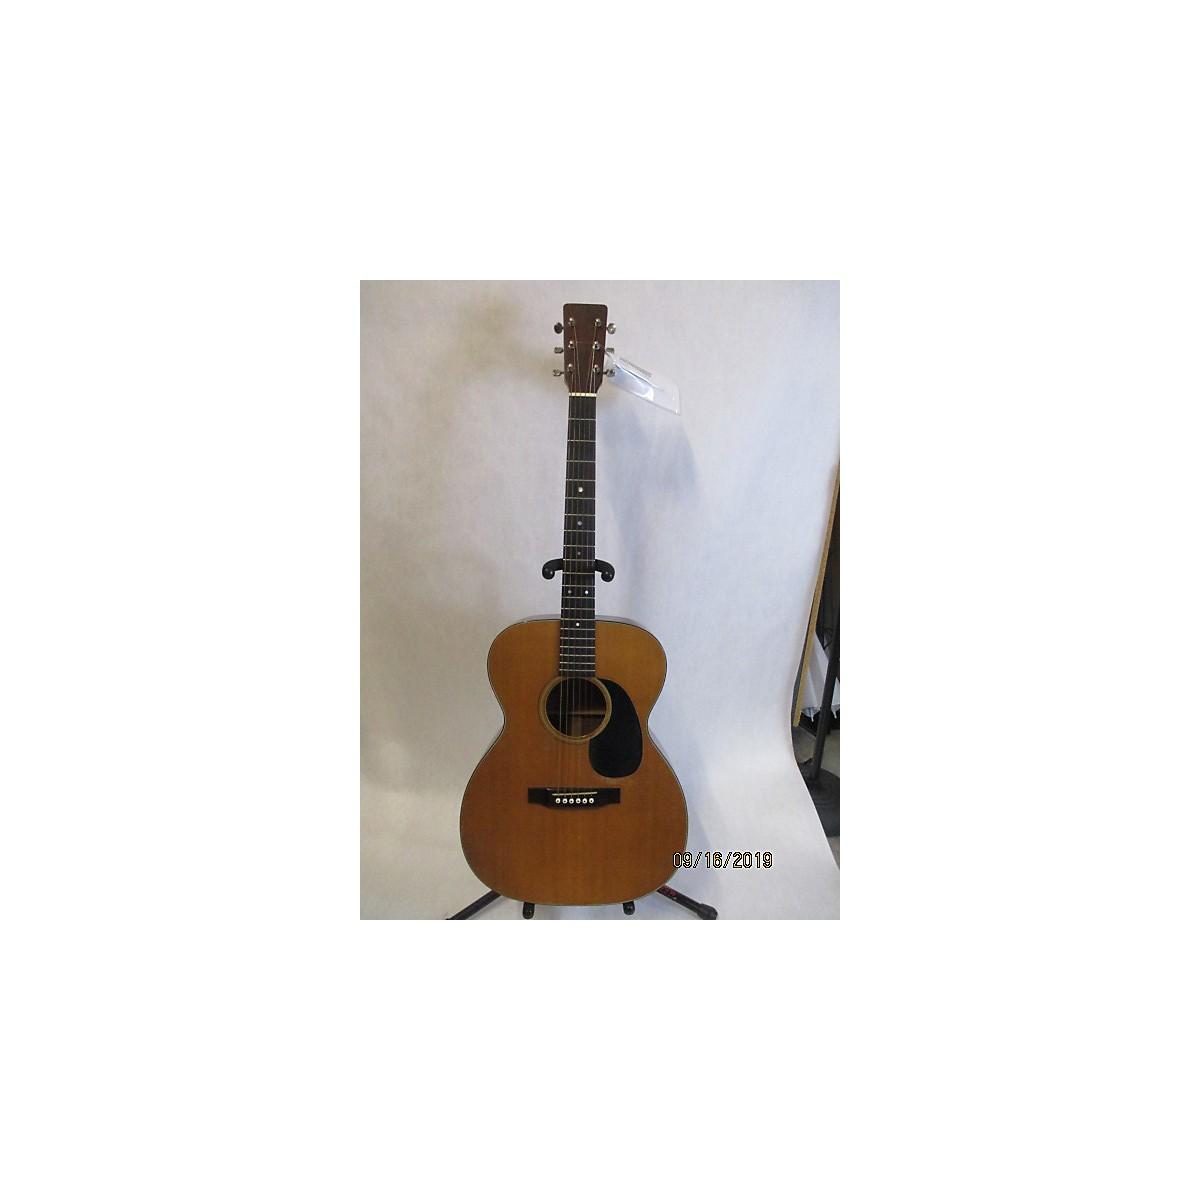 Martin 1969 00018 Acoustic Guitar